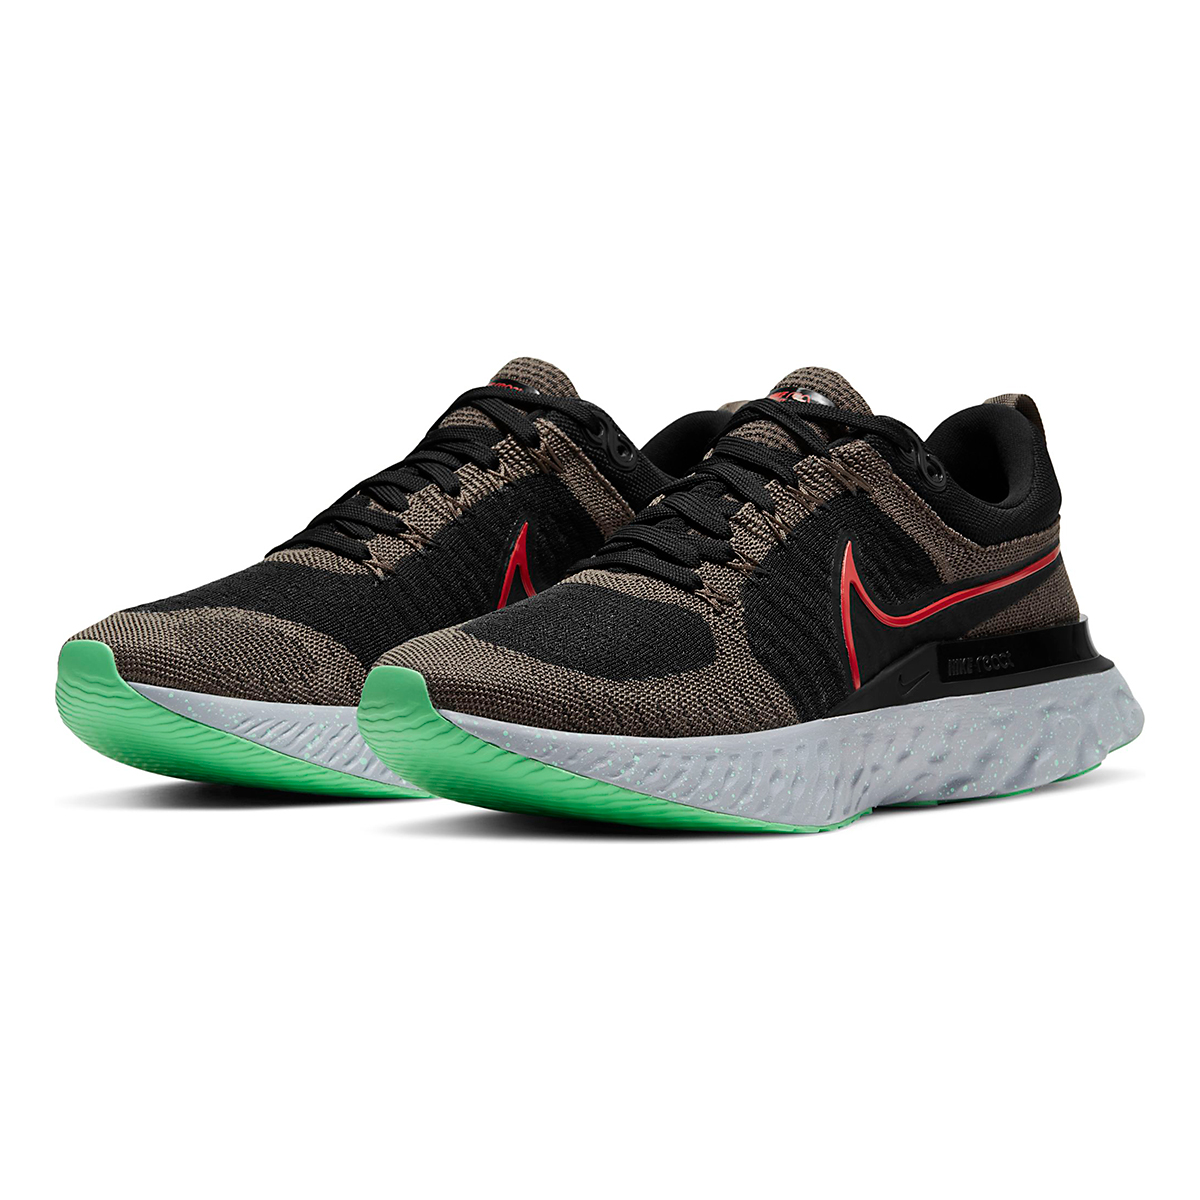 Men's Nike React Infinity Run Flyknit 2 Running Shoe - Color: Ridgerock/Chile Red/Black/Green Glow - Size: 6 - Width: Regular, Ridgerock/Chile Red/Black/Green Glow, large, image 4